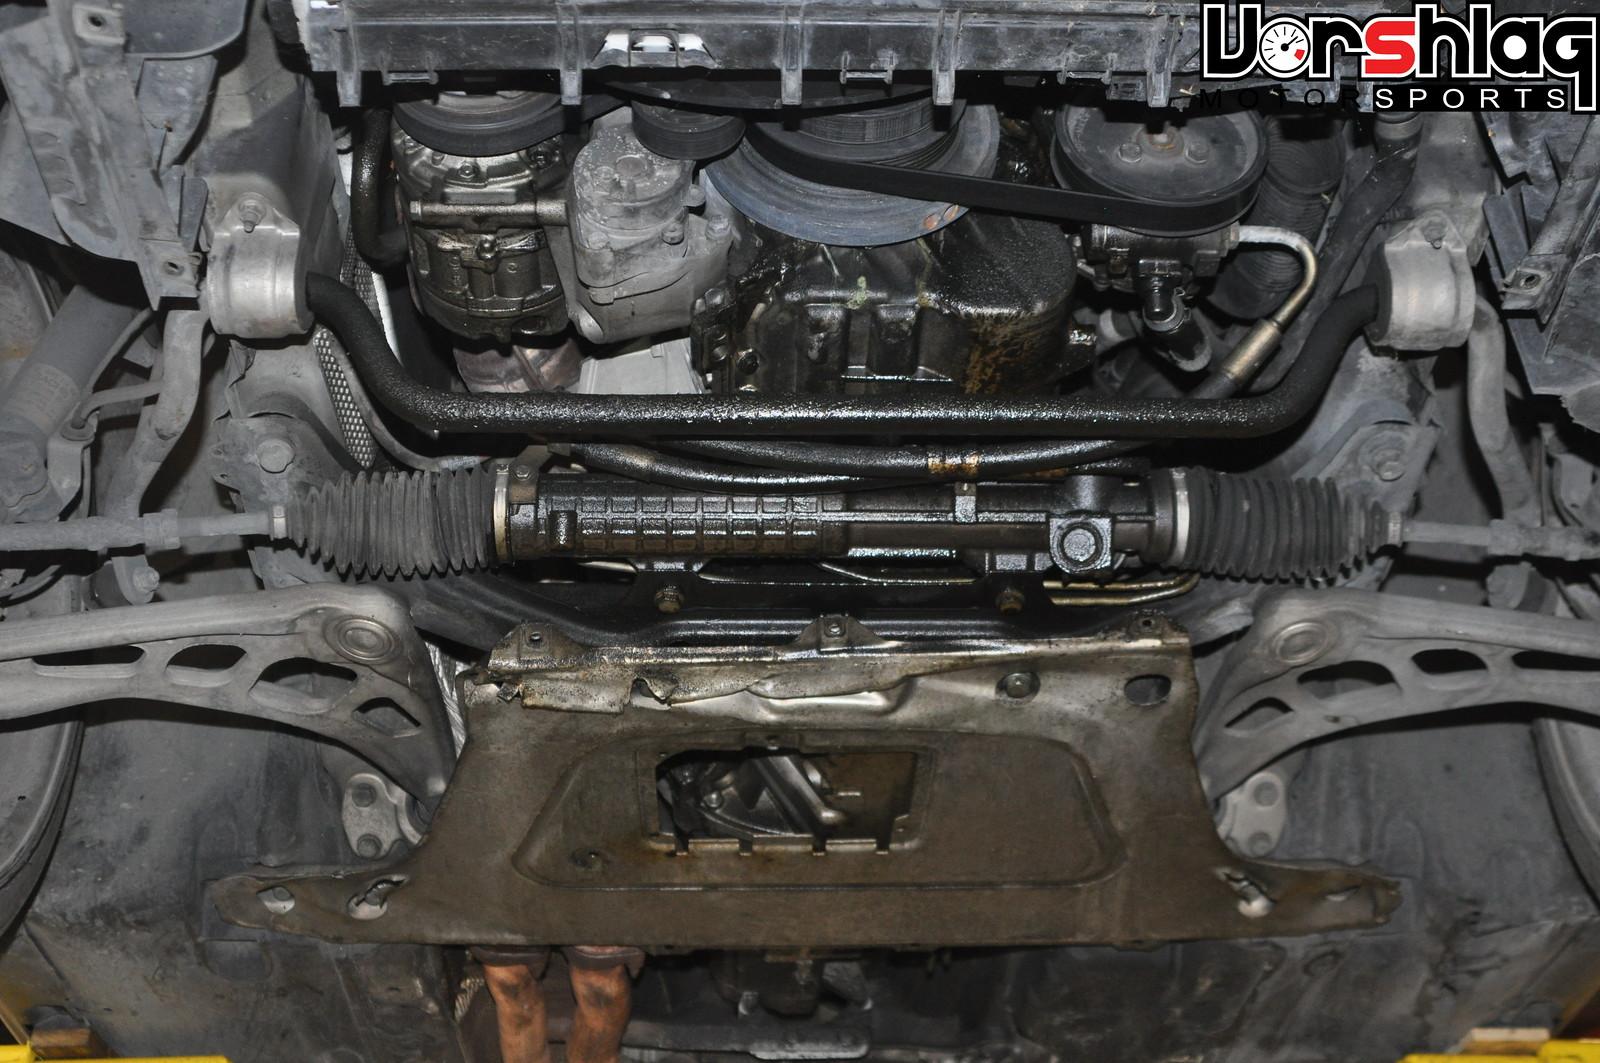 Vorshlag Bmw E46 Daily Driven Track Car Project Archive Vanos Wiring Diagram E46fanatics Motorsports Forum